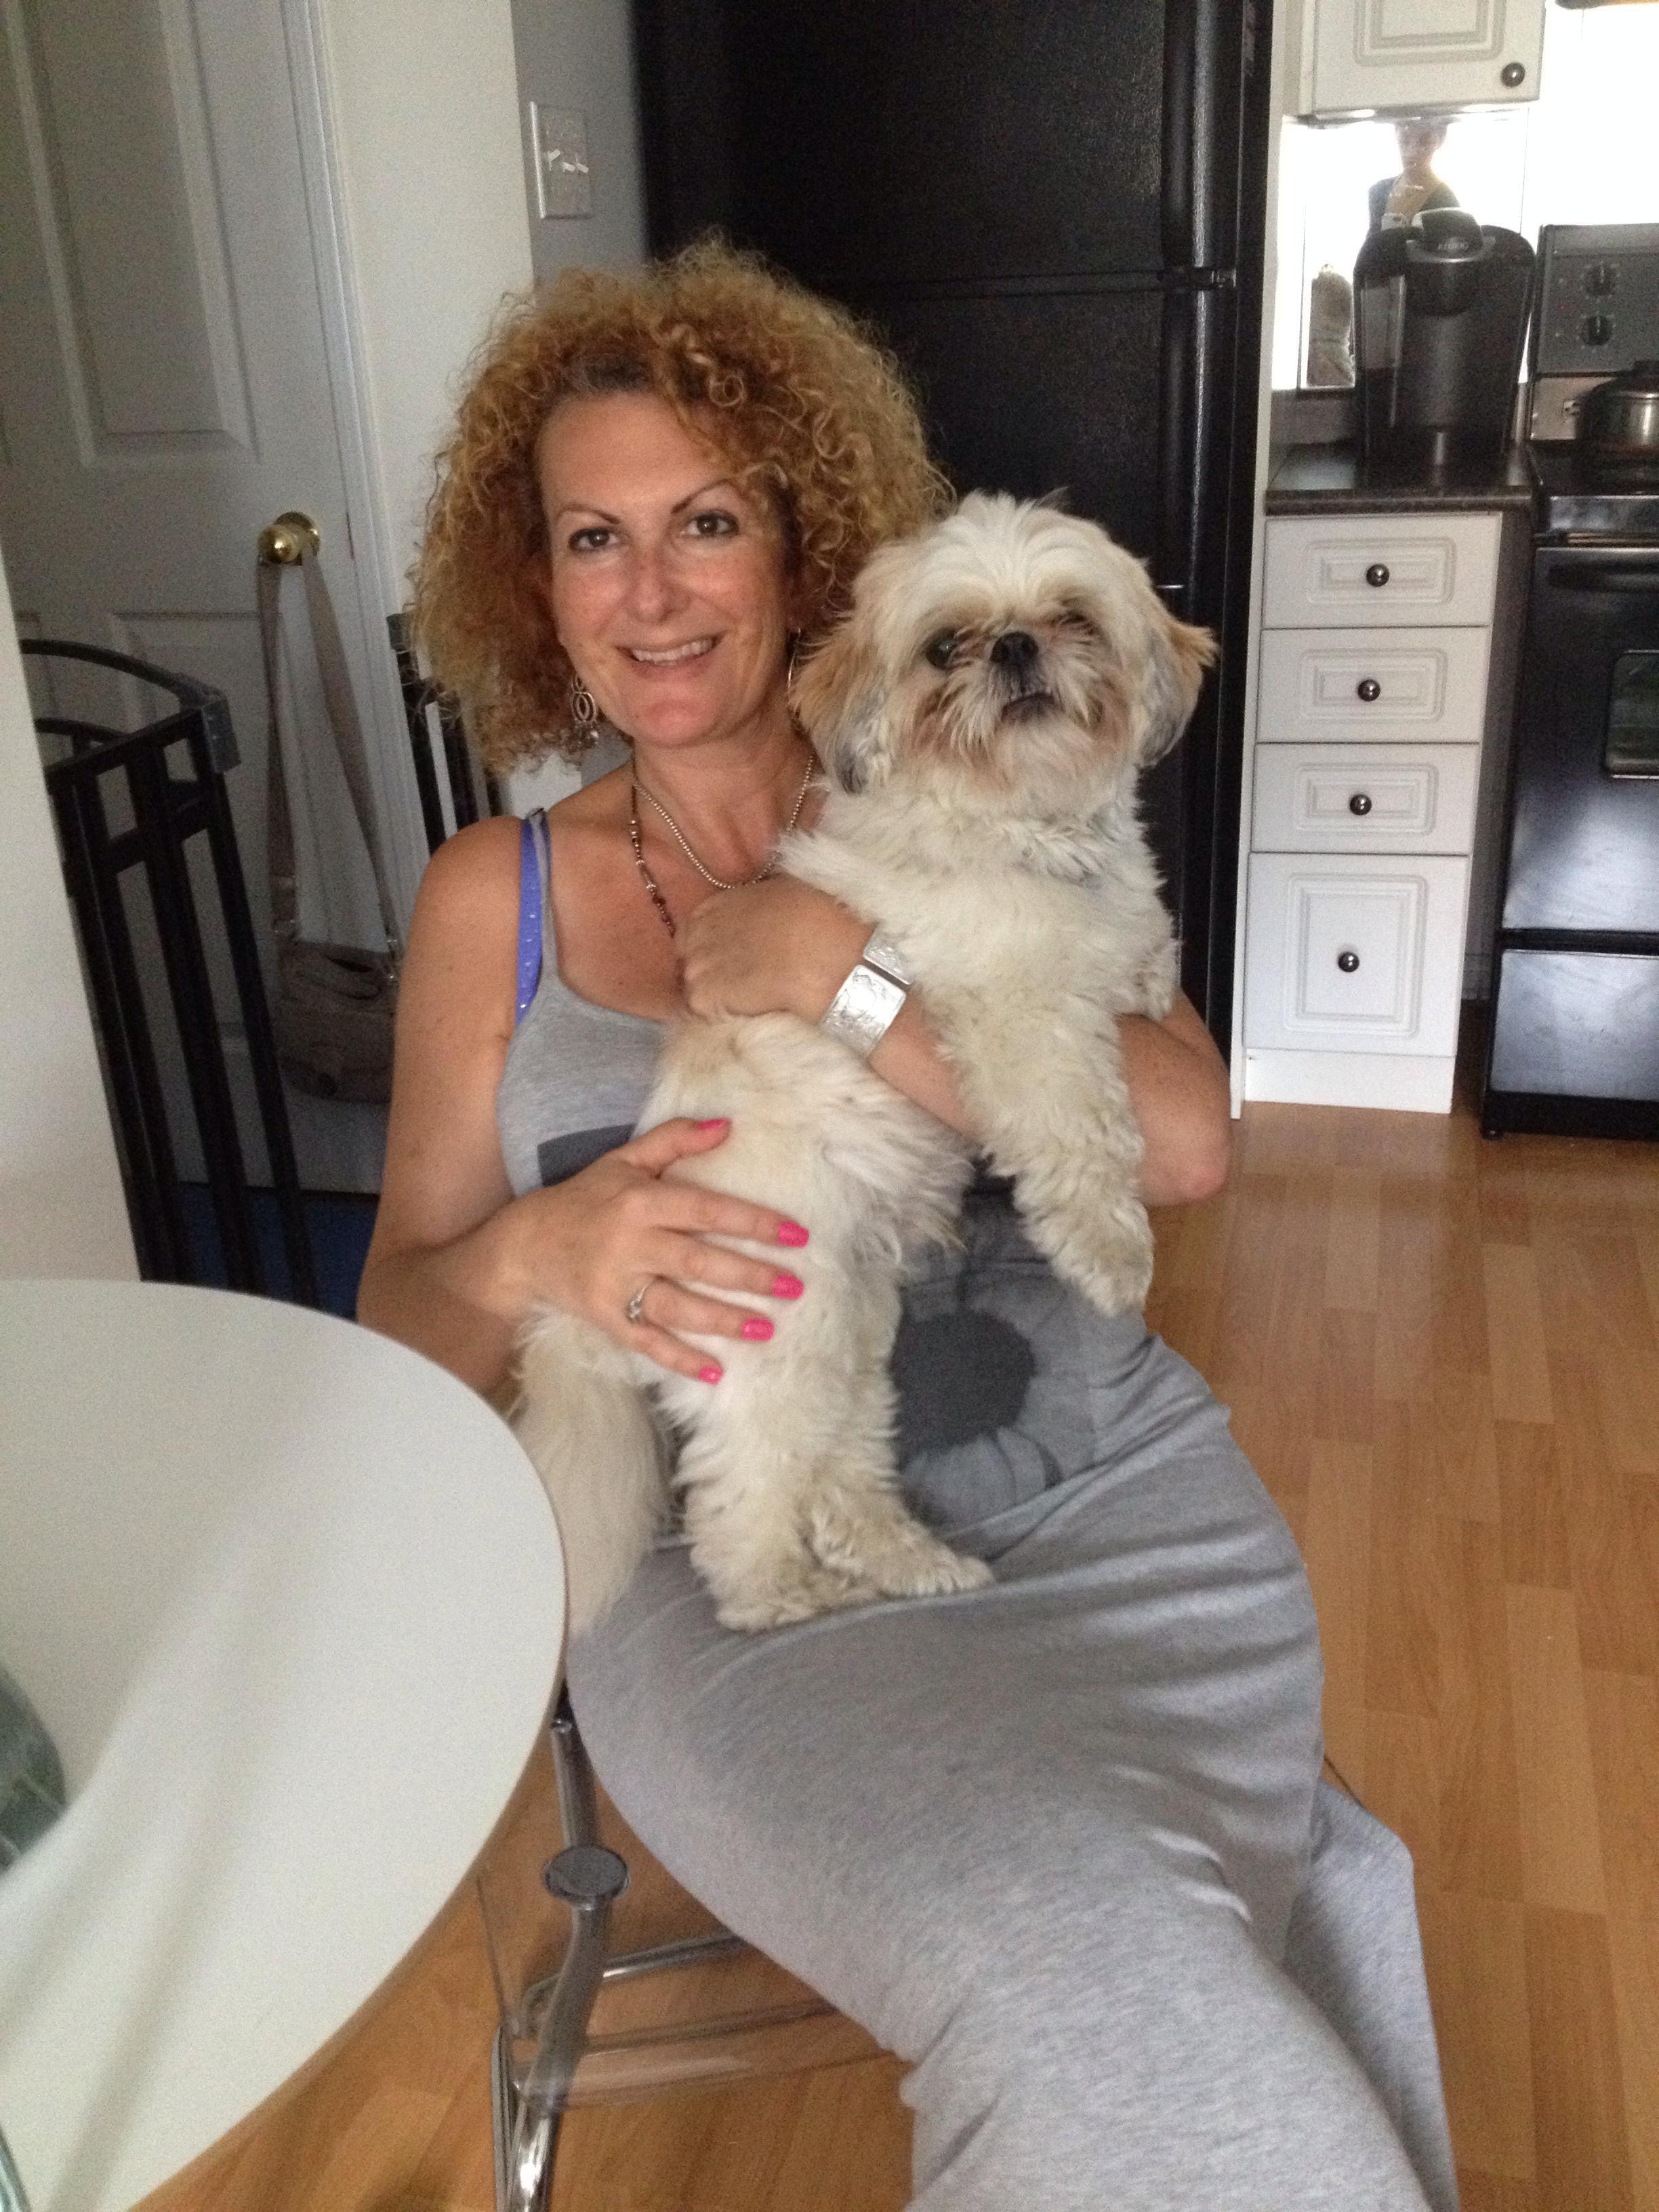 Renee's dog boarding